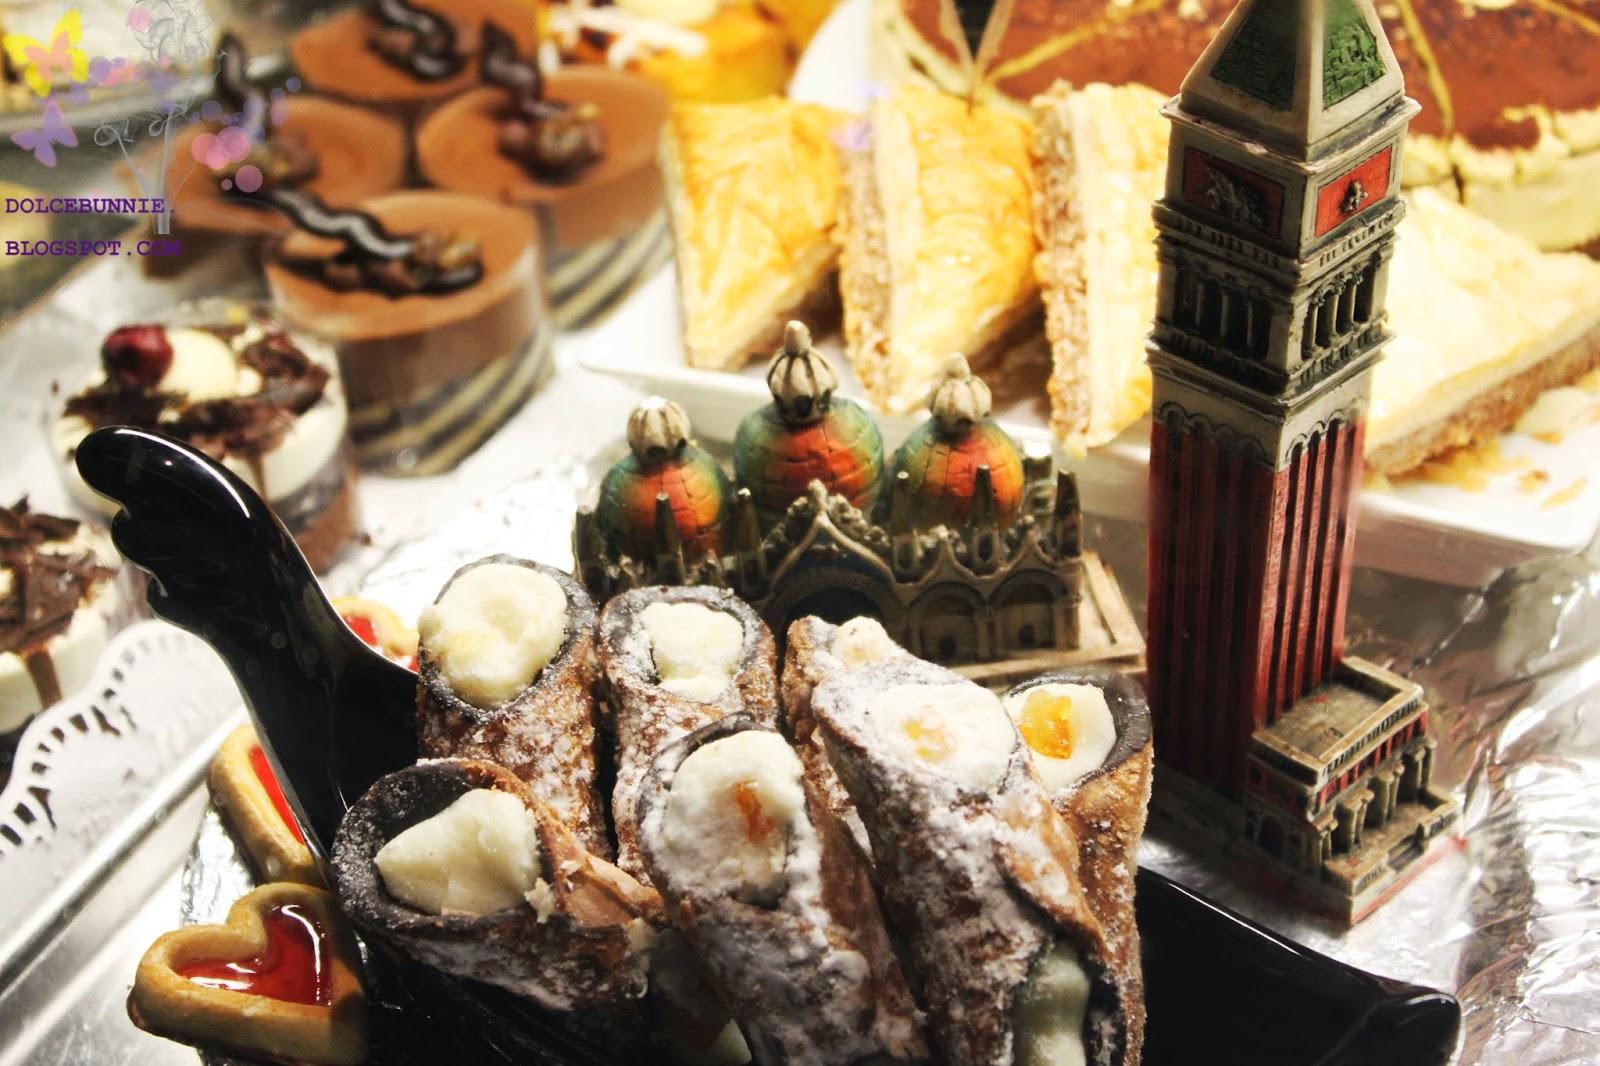 LaDolceVita Desserts